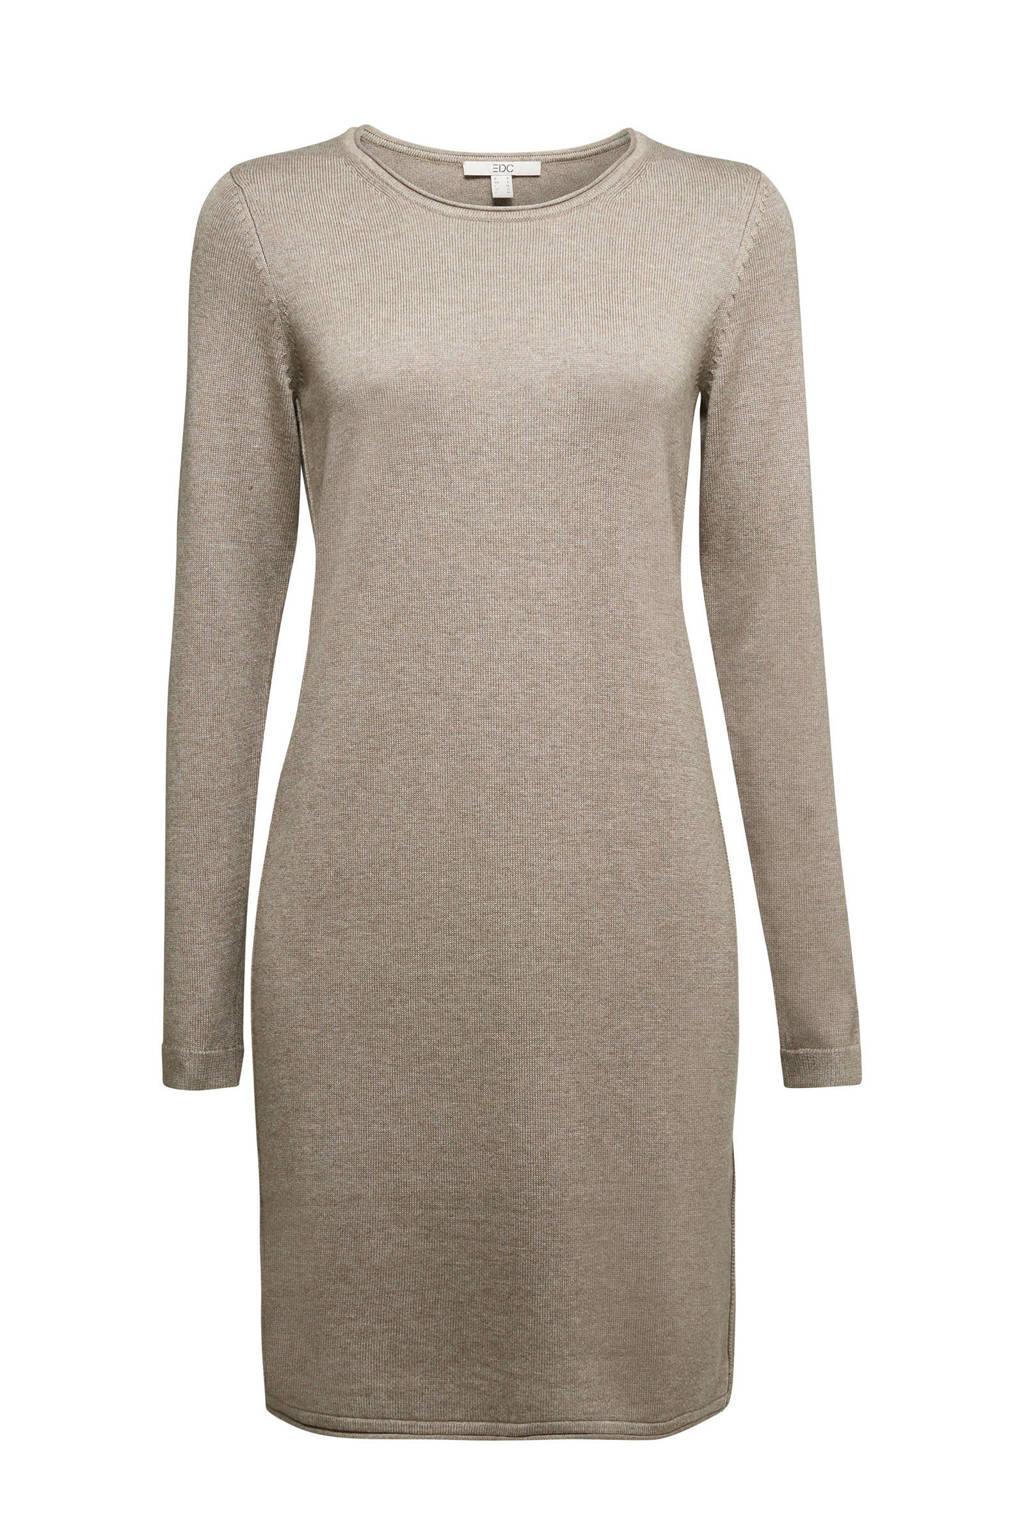 edc Women fijngebreide jurk zand, Zand